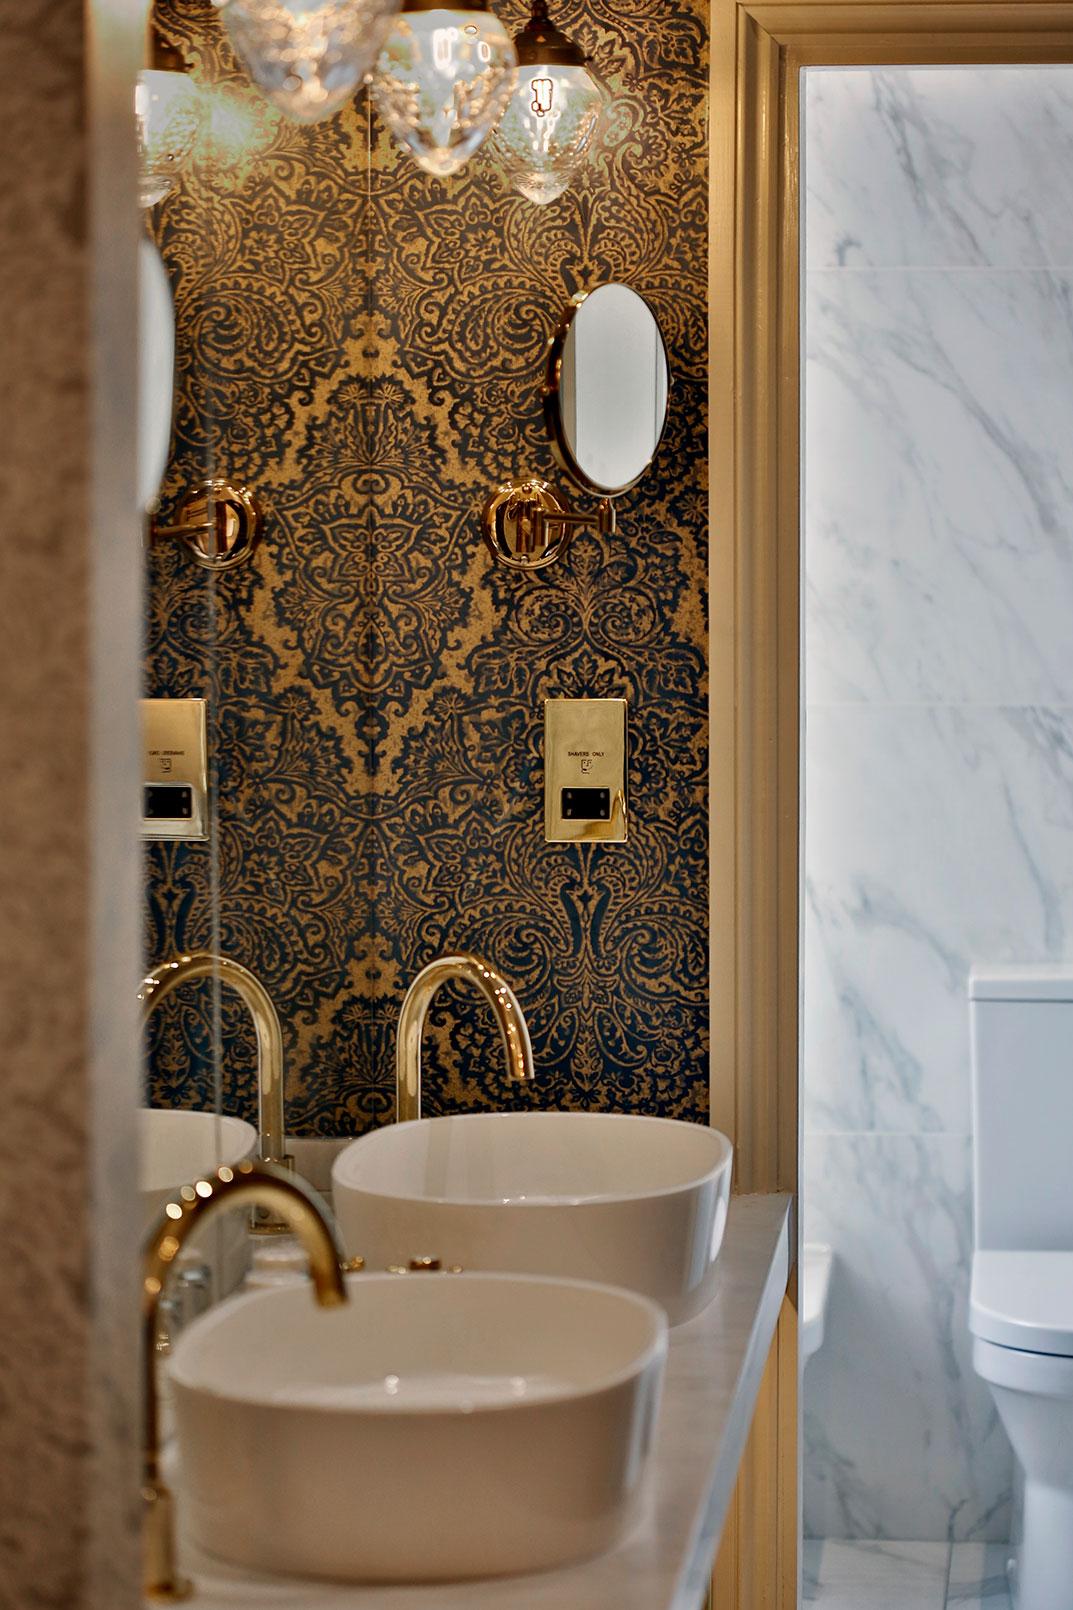 Best Western Hotel Room: Best Western Grimsby Oaklands Hall Hotel